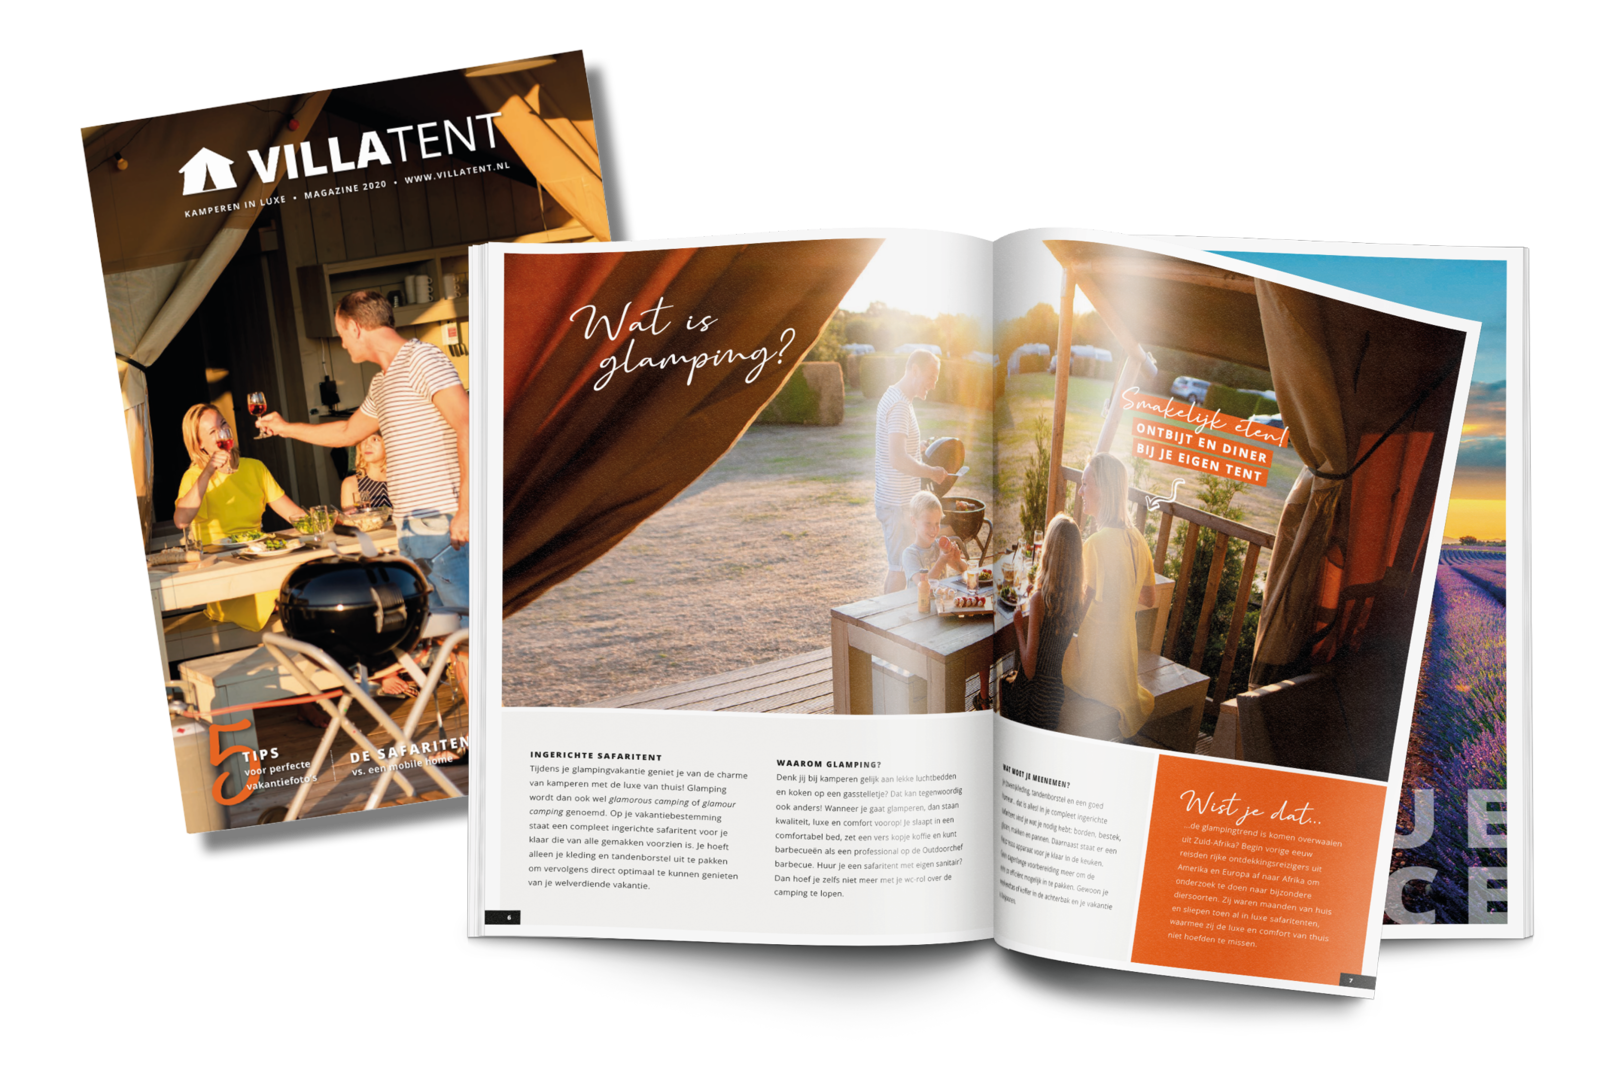 Villatent glamping magazine 2020